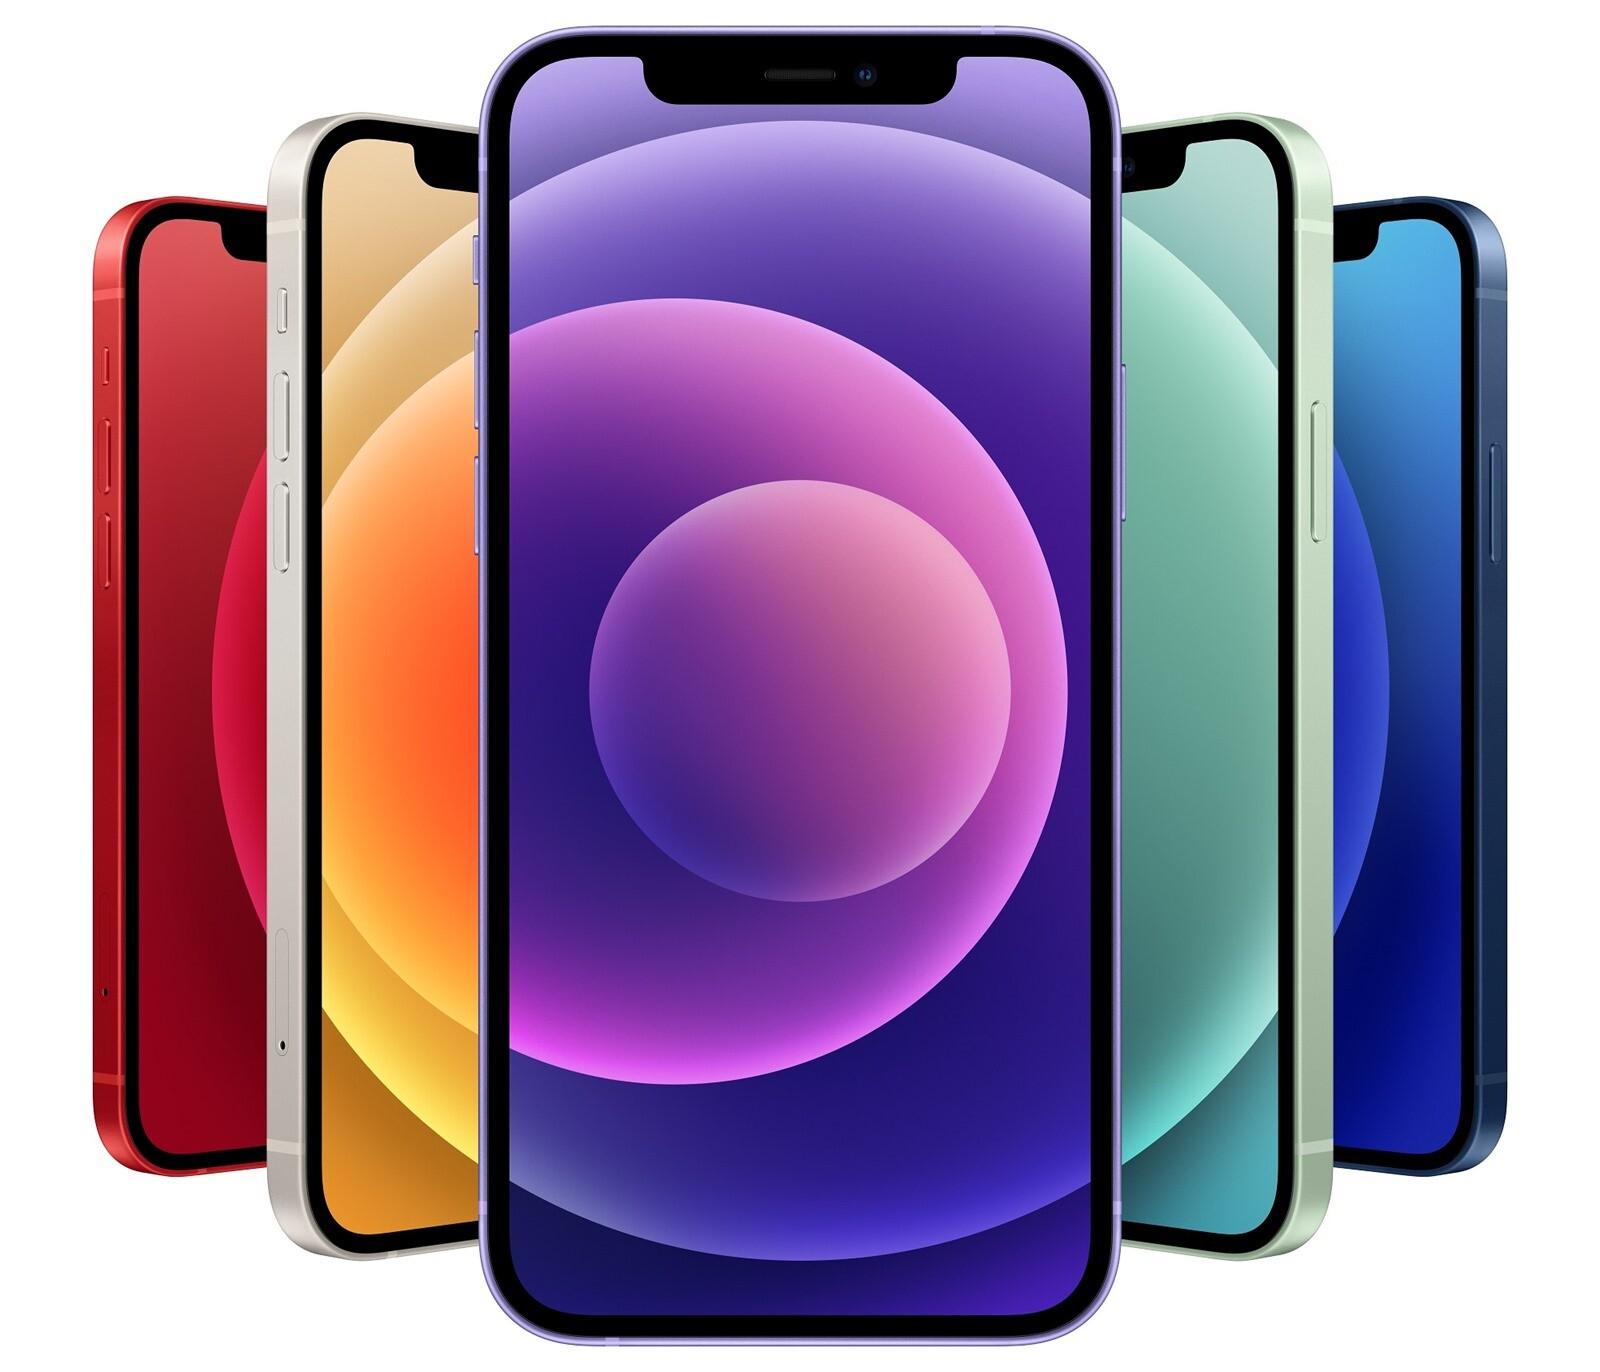 【PChome-24h 購物】iPhone-12/-iPhone-12-mini.jpg @3C 達人廖阿輝